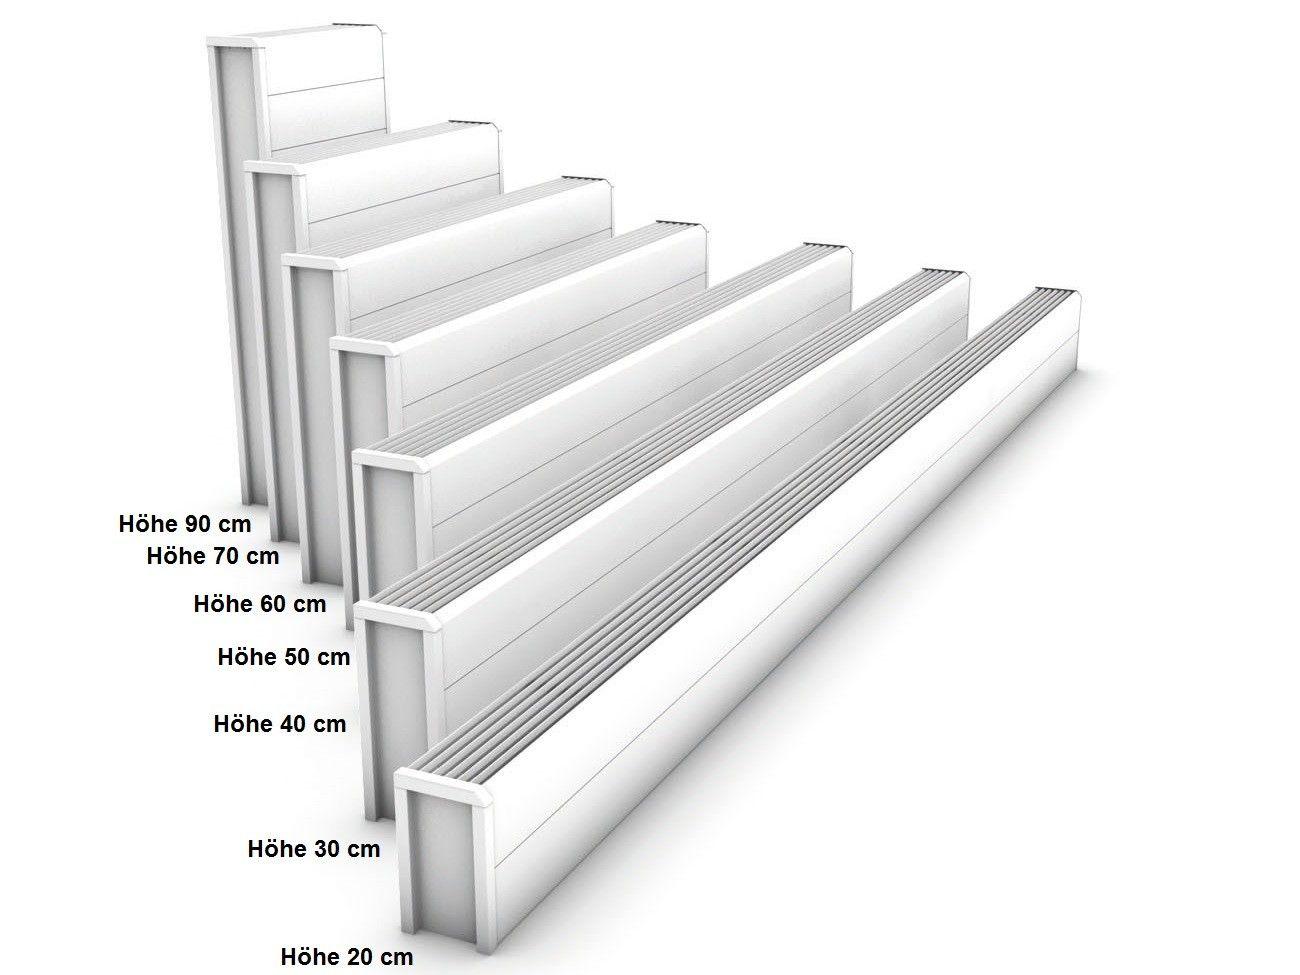 Einzigartig Heizkörper 30 x 13 x ab 40 cm ab 330 Watt Heizkörper Bauhöhe 300  JK31